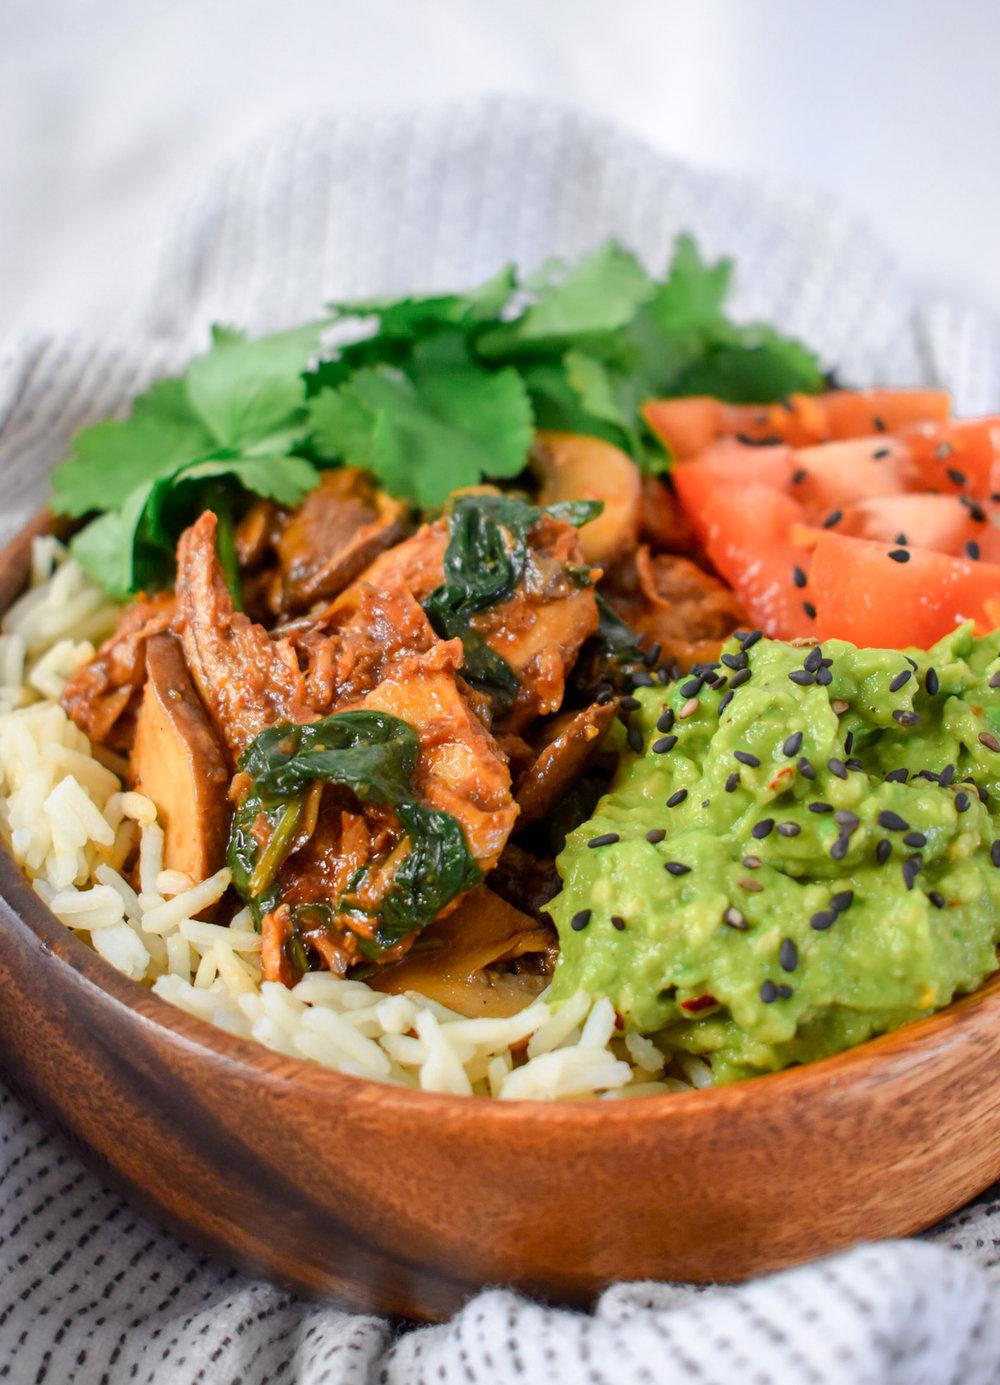 Vegan Oumph! Buddha Bowl with Avocado, Coriander, Tomato and Rice - Ally The Earthling